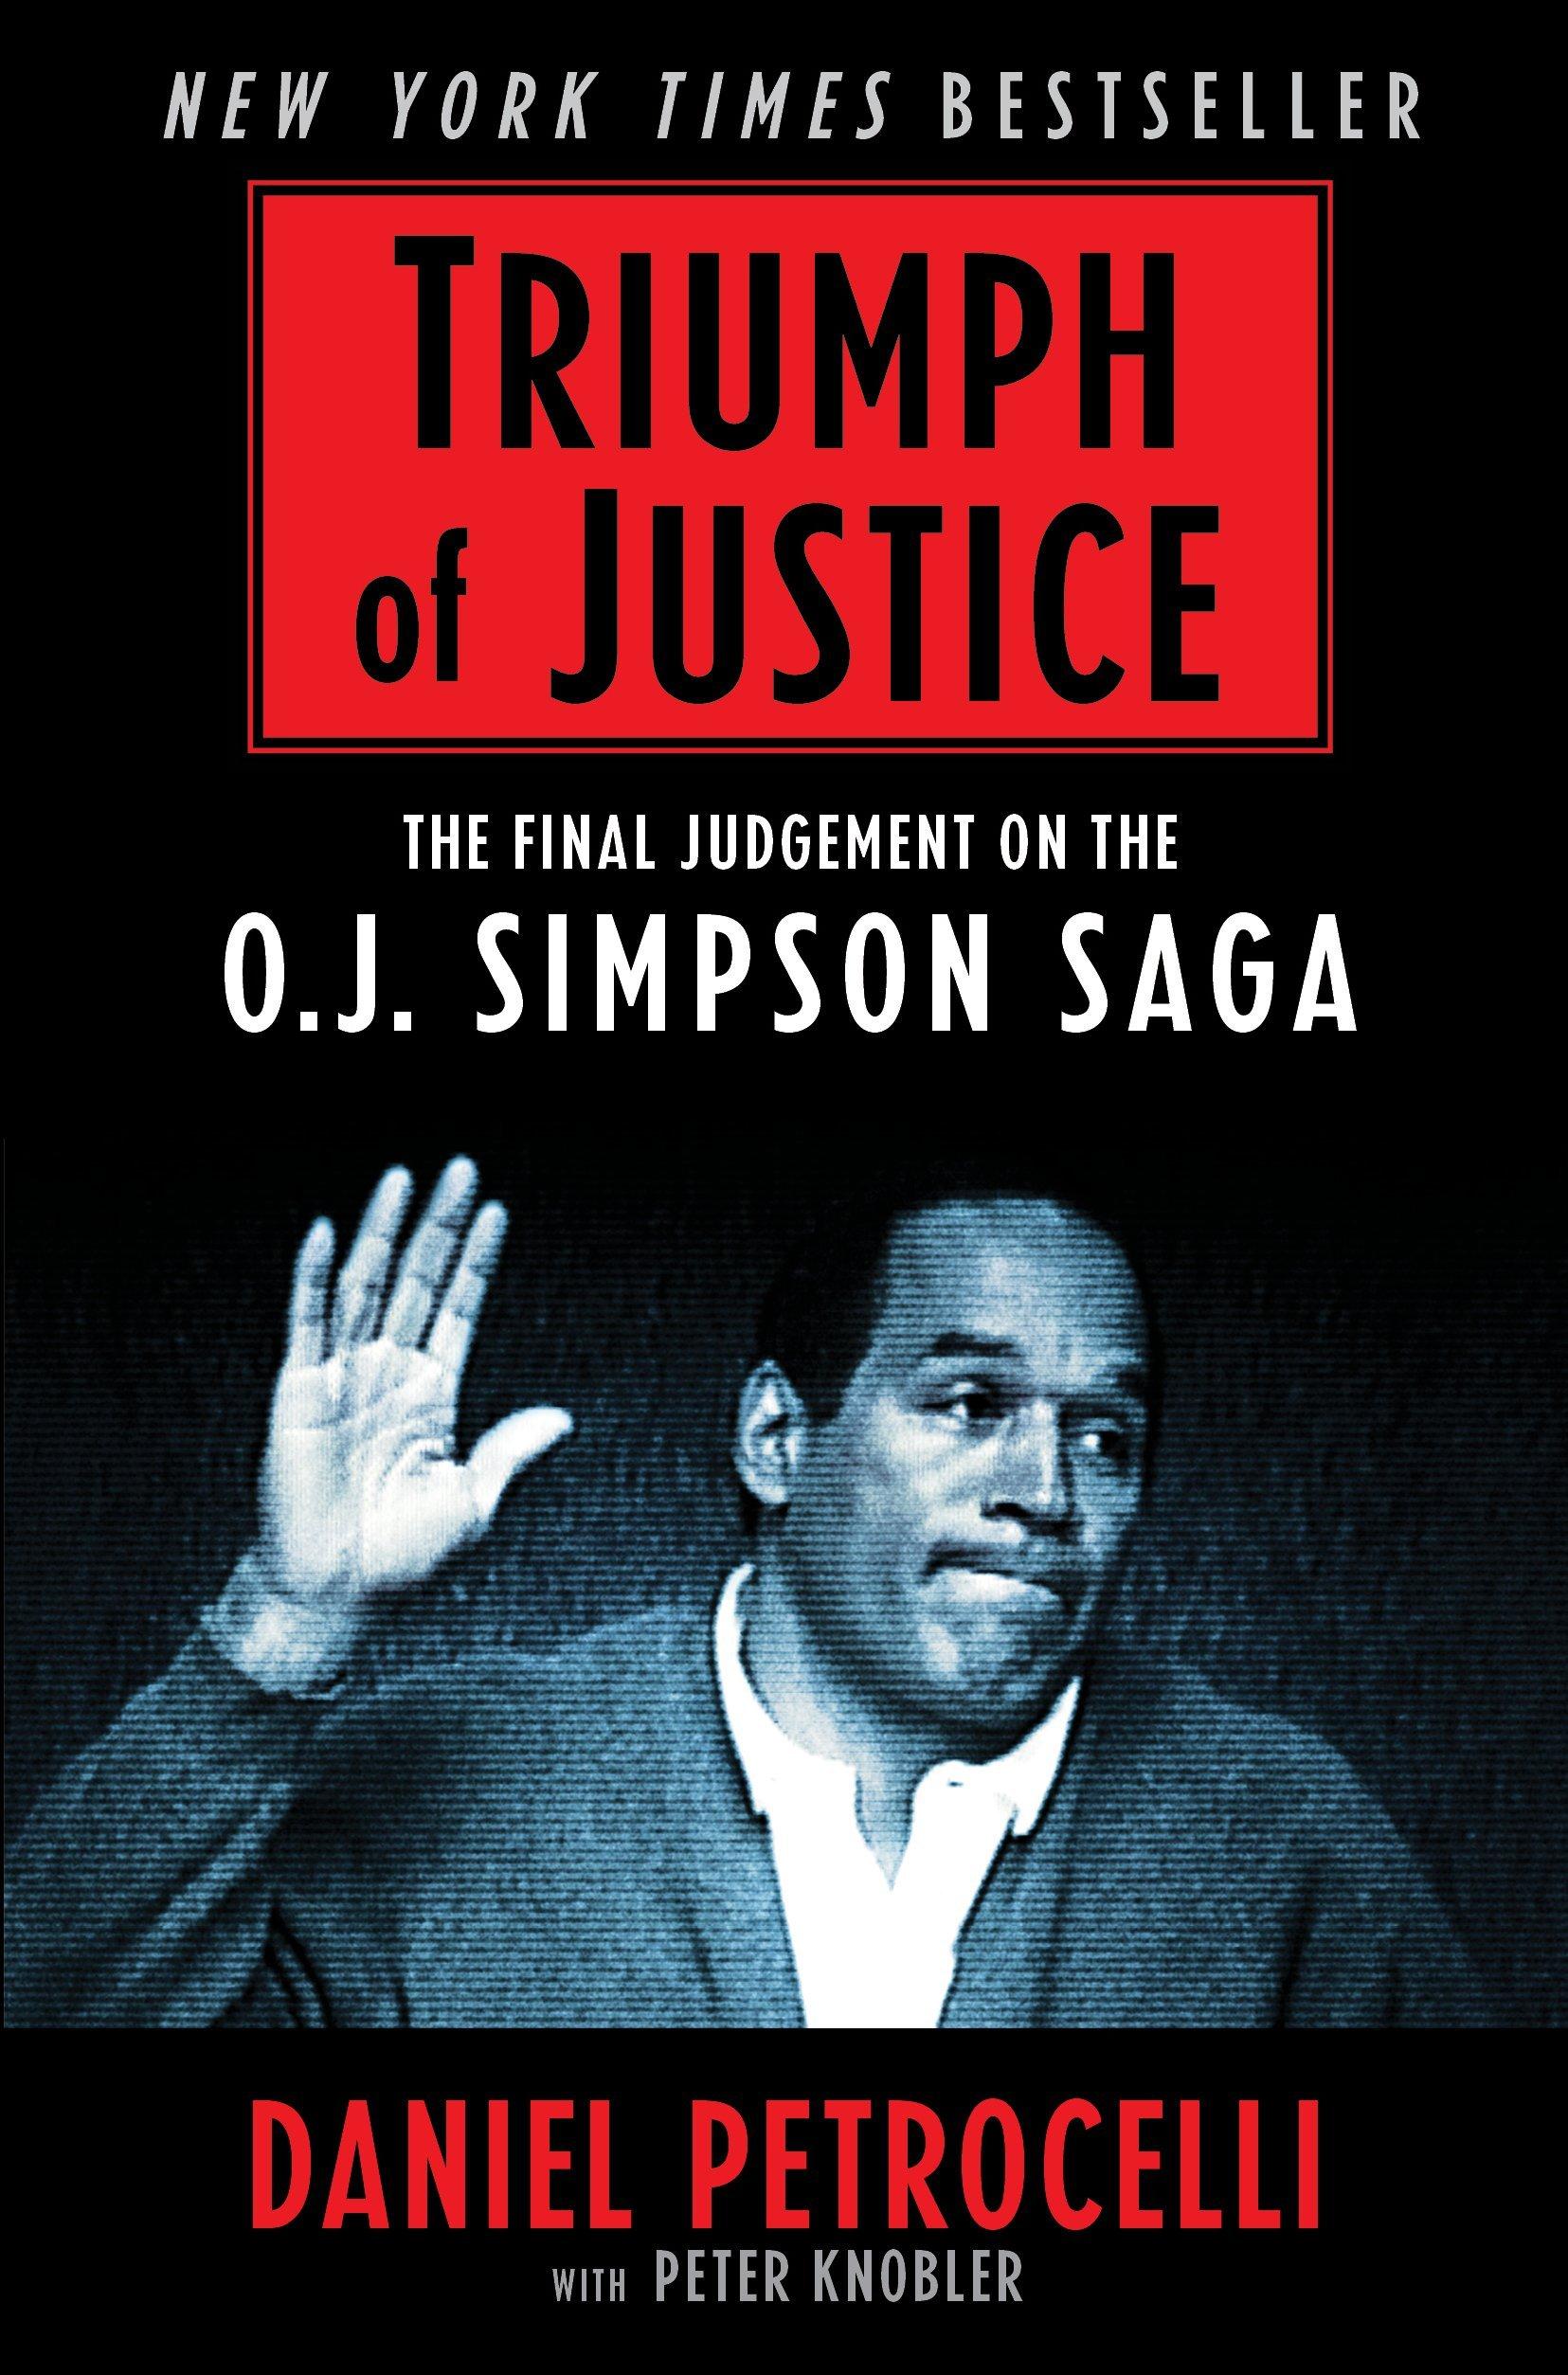 Triumph of Justice: Closing the Book on the O.J. Simpson Saga ebook